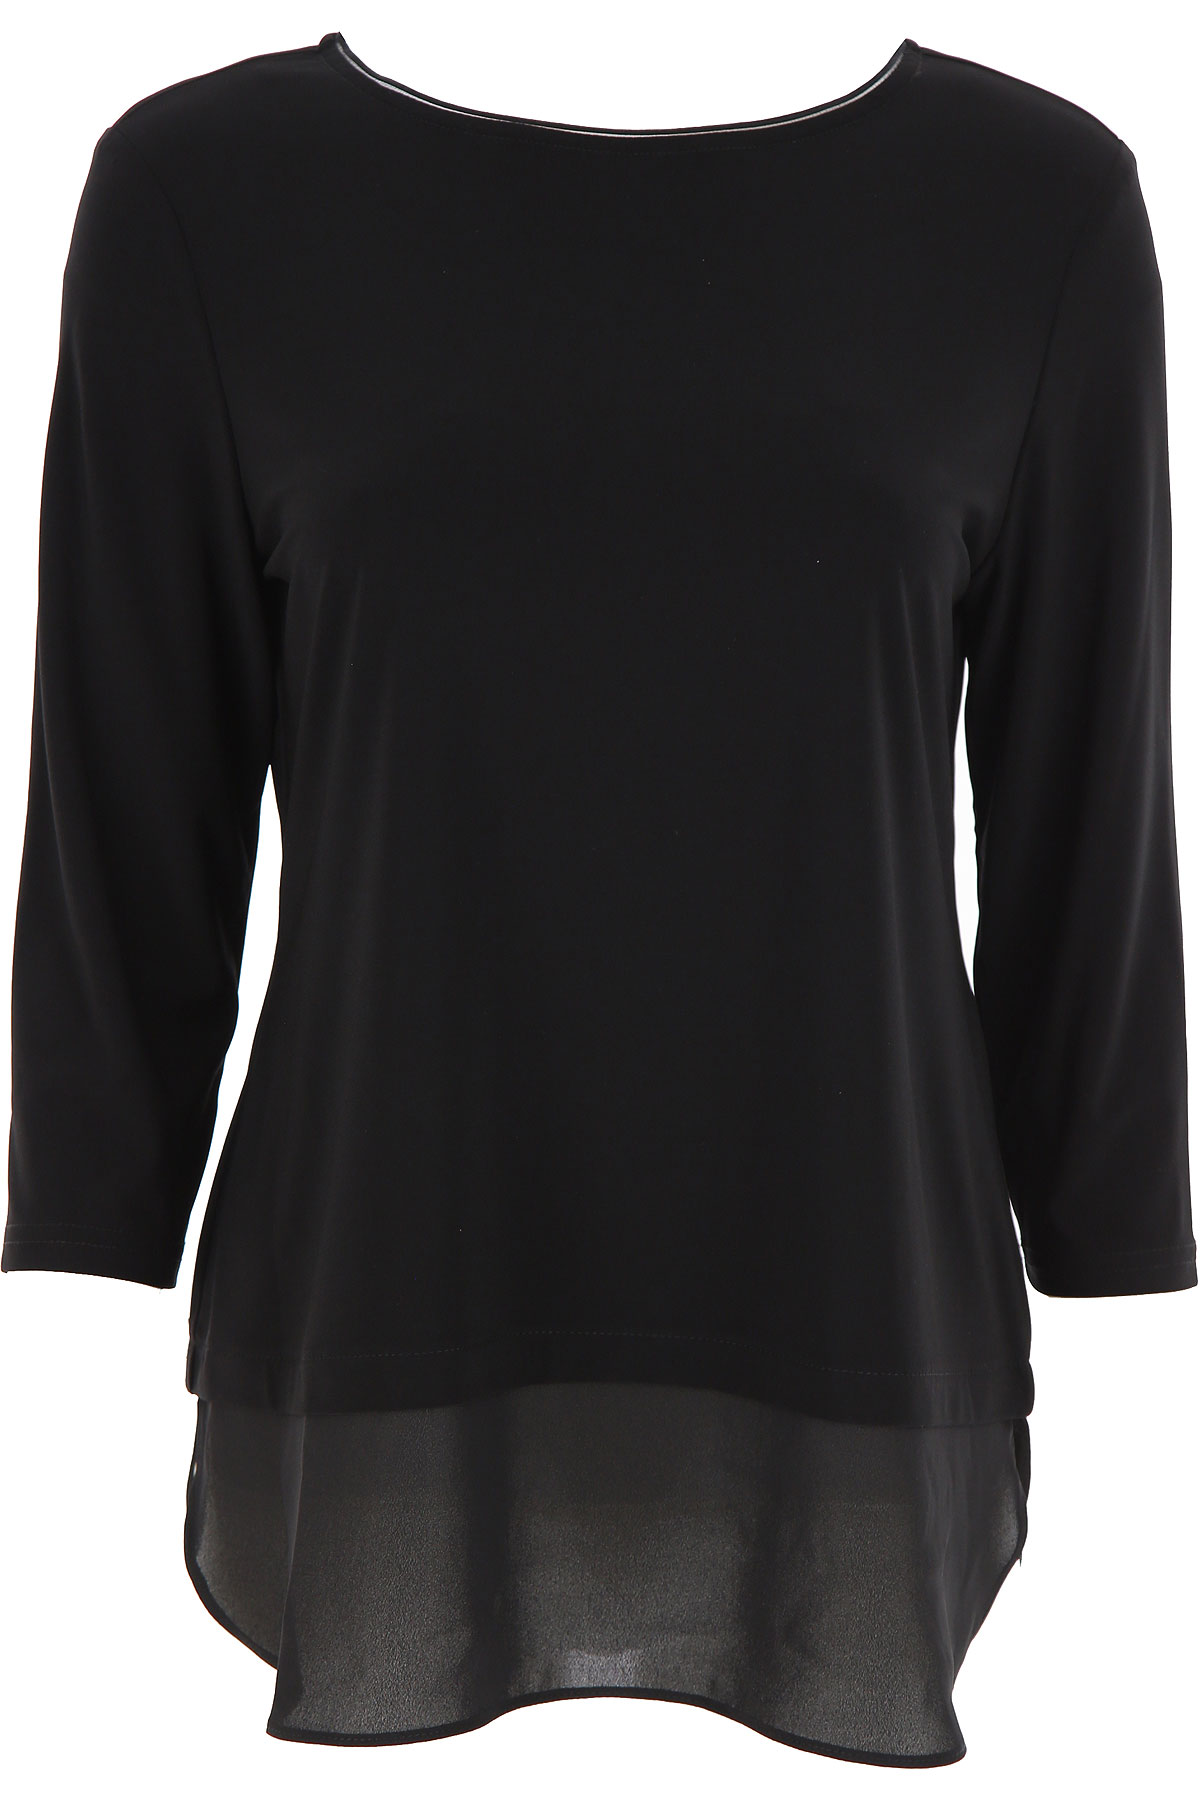 Joseph Ribkoff Top for Women On Sale, Black, polyester, 2019, 10 34 8